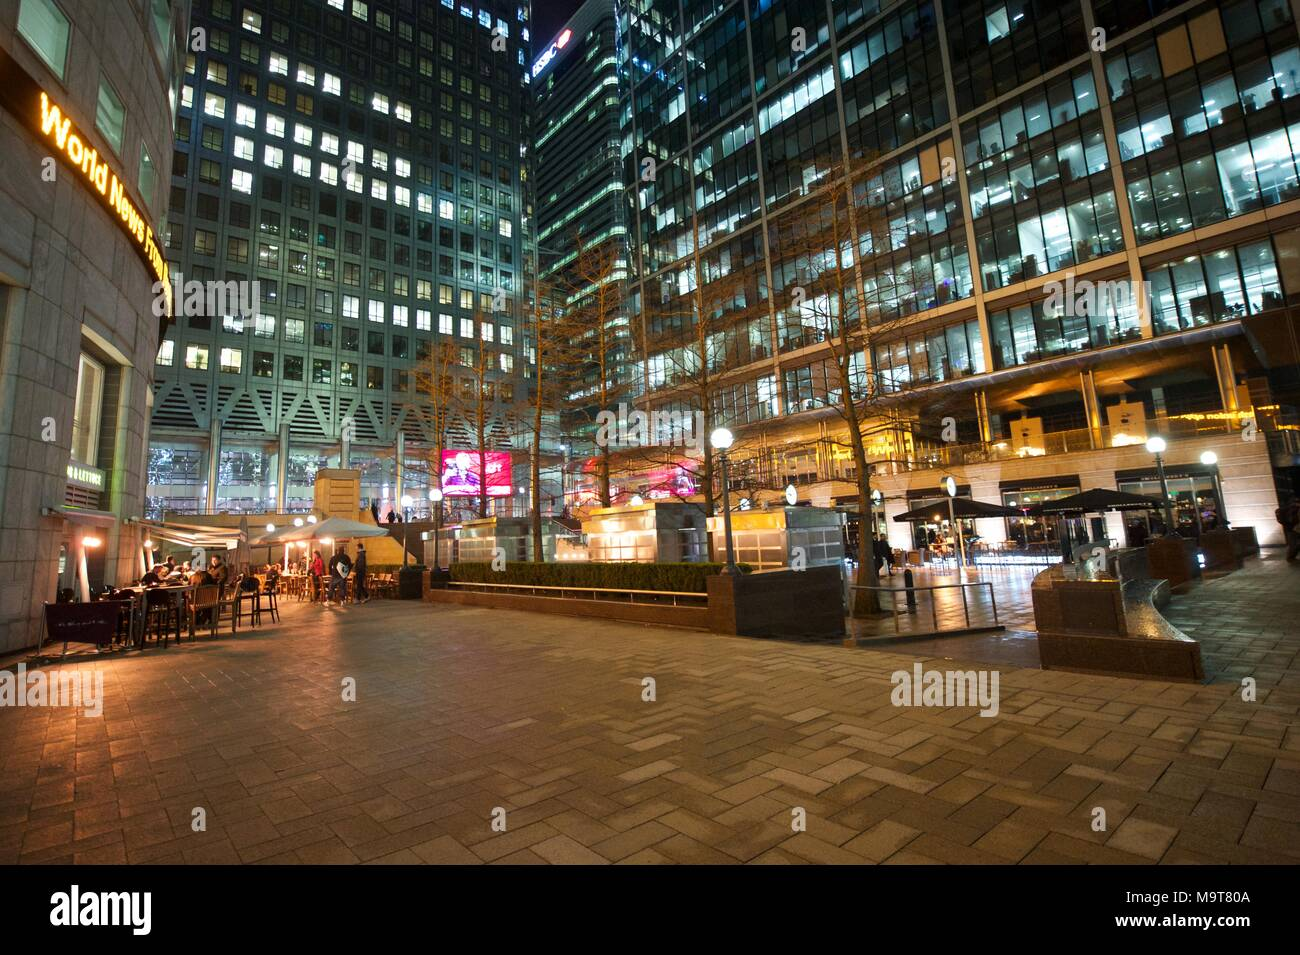 Canary Wharf at night - Stock Image